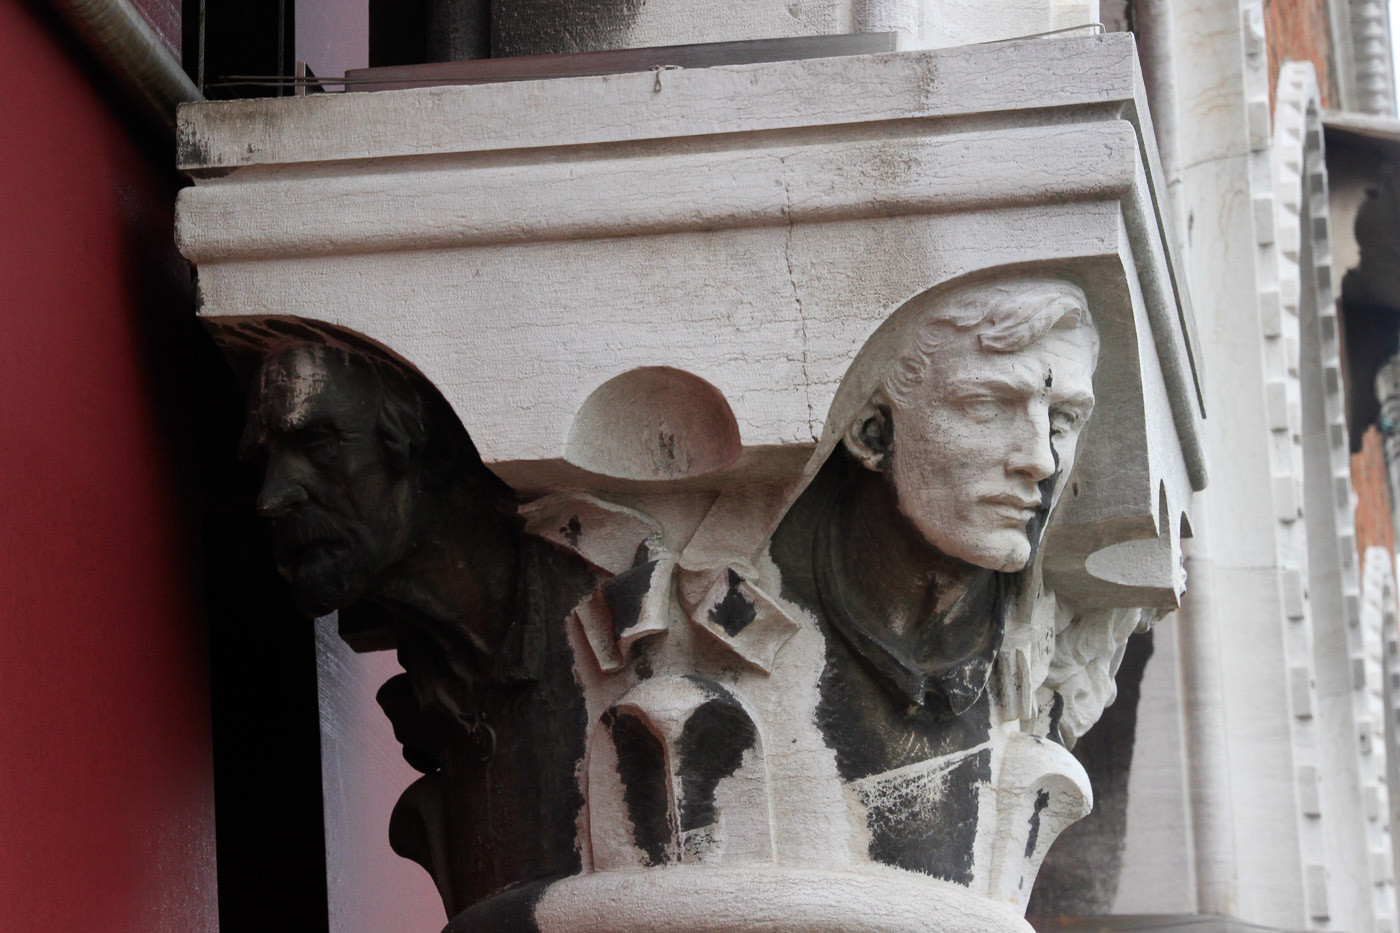 con cuatro cabezas esculpidas